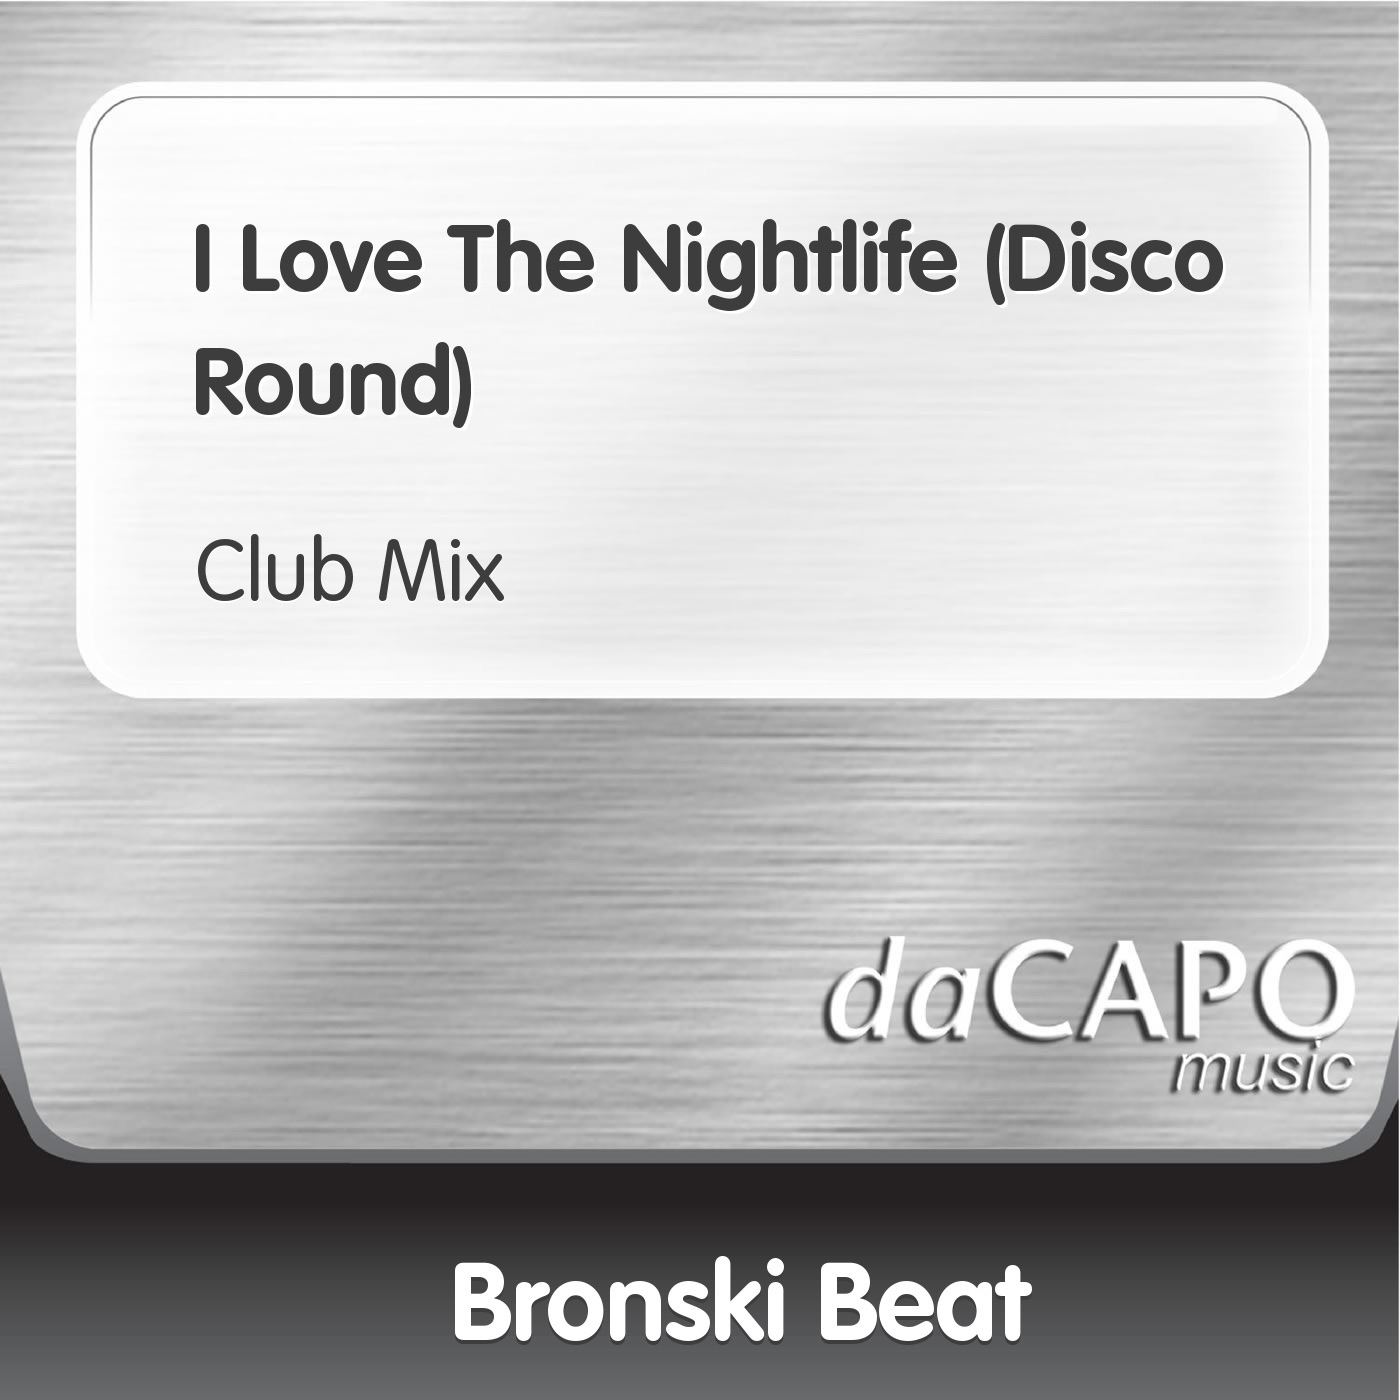 I Love the Nightlife (Disco Round) [Club Mix] - Single